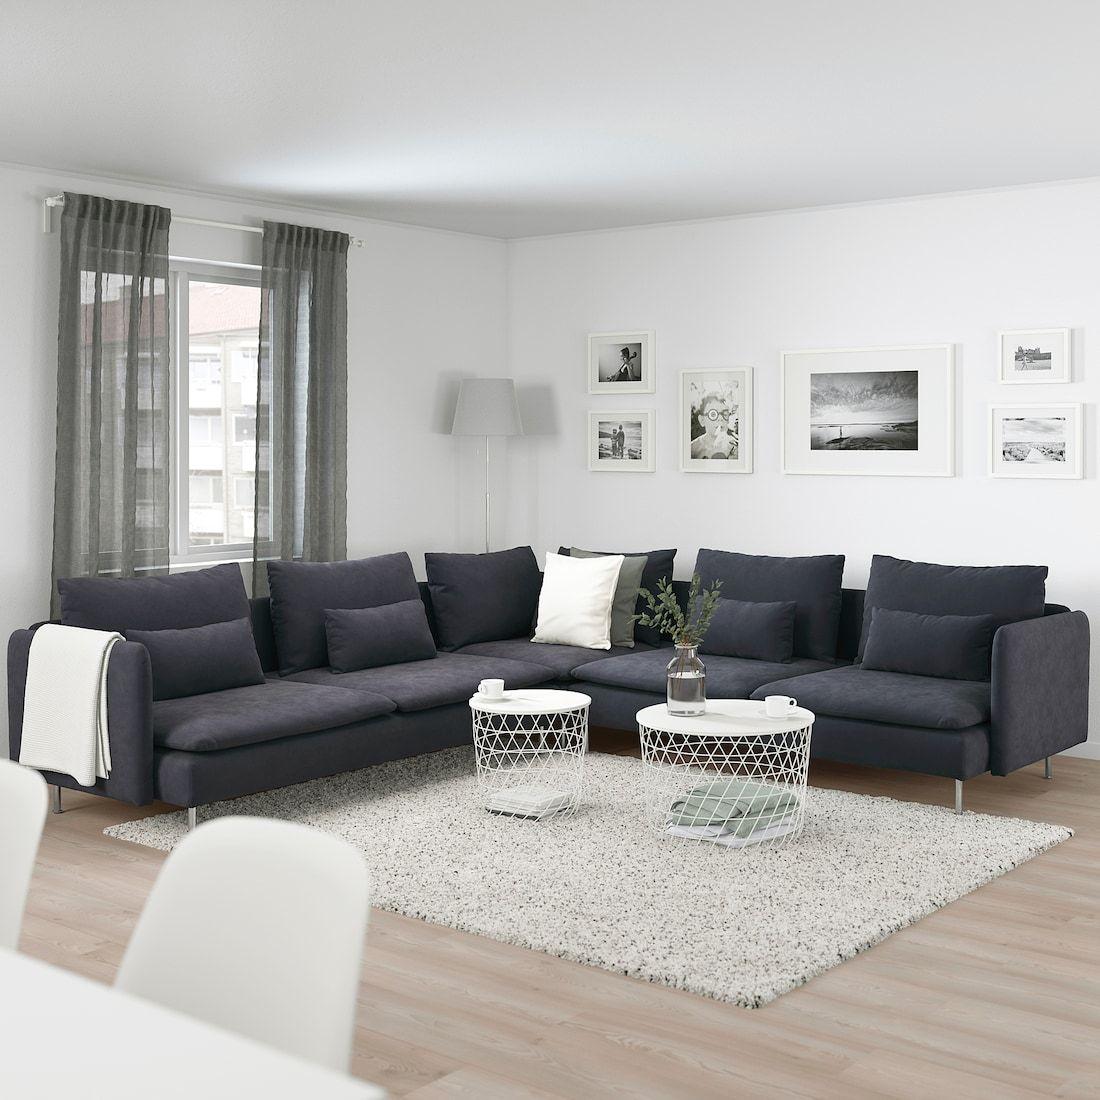 SÖDERHAMN Sectional, 5-seat – Samsta dark gray – IKEA